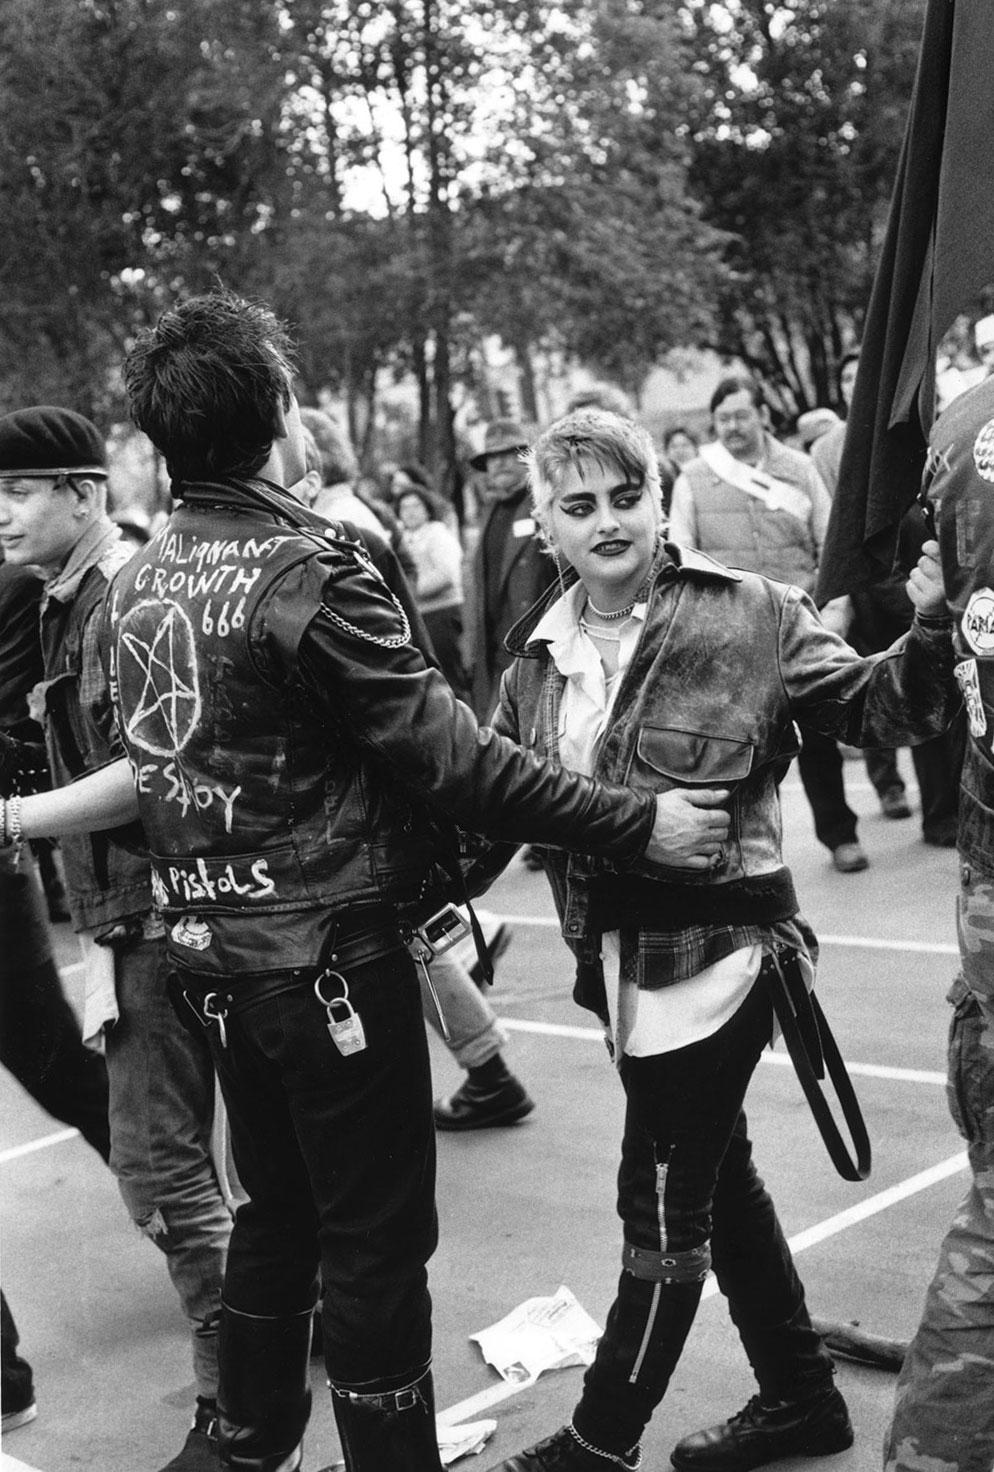 Political Punks